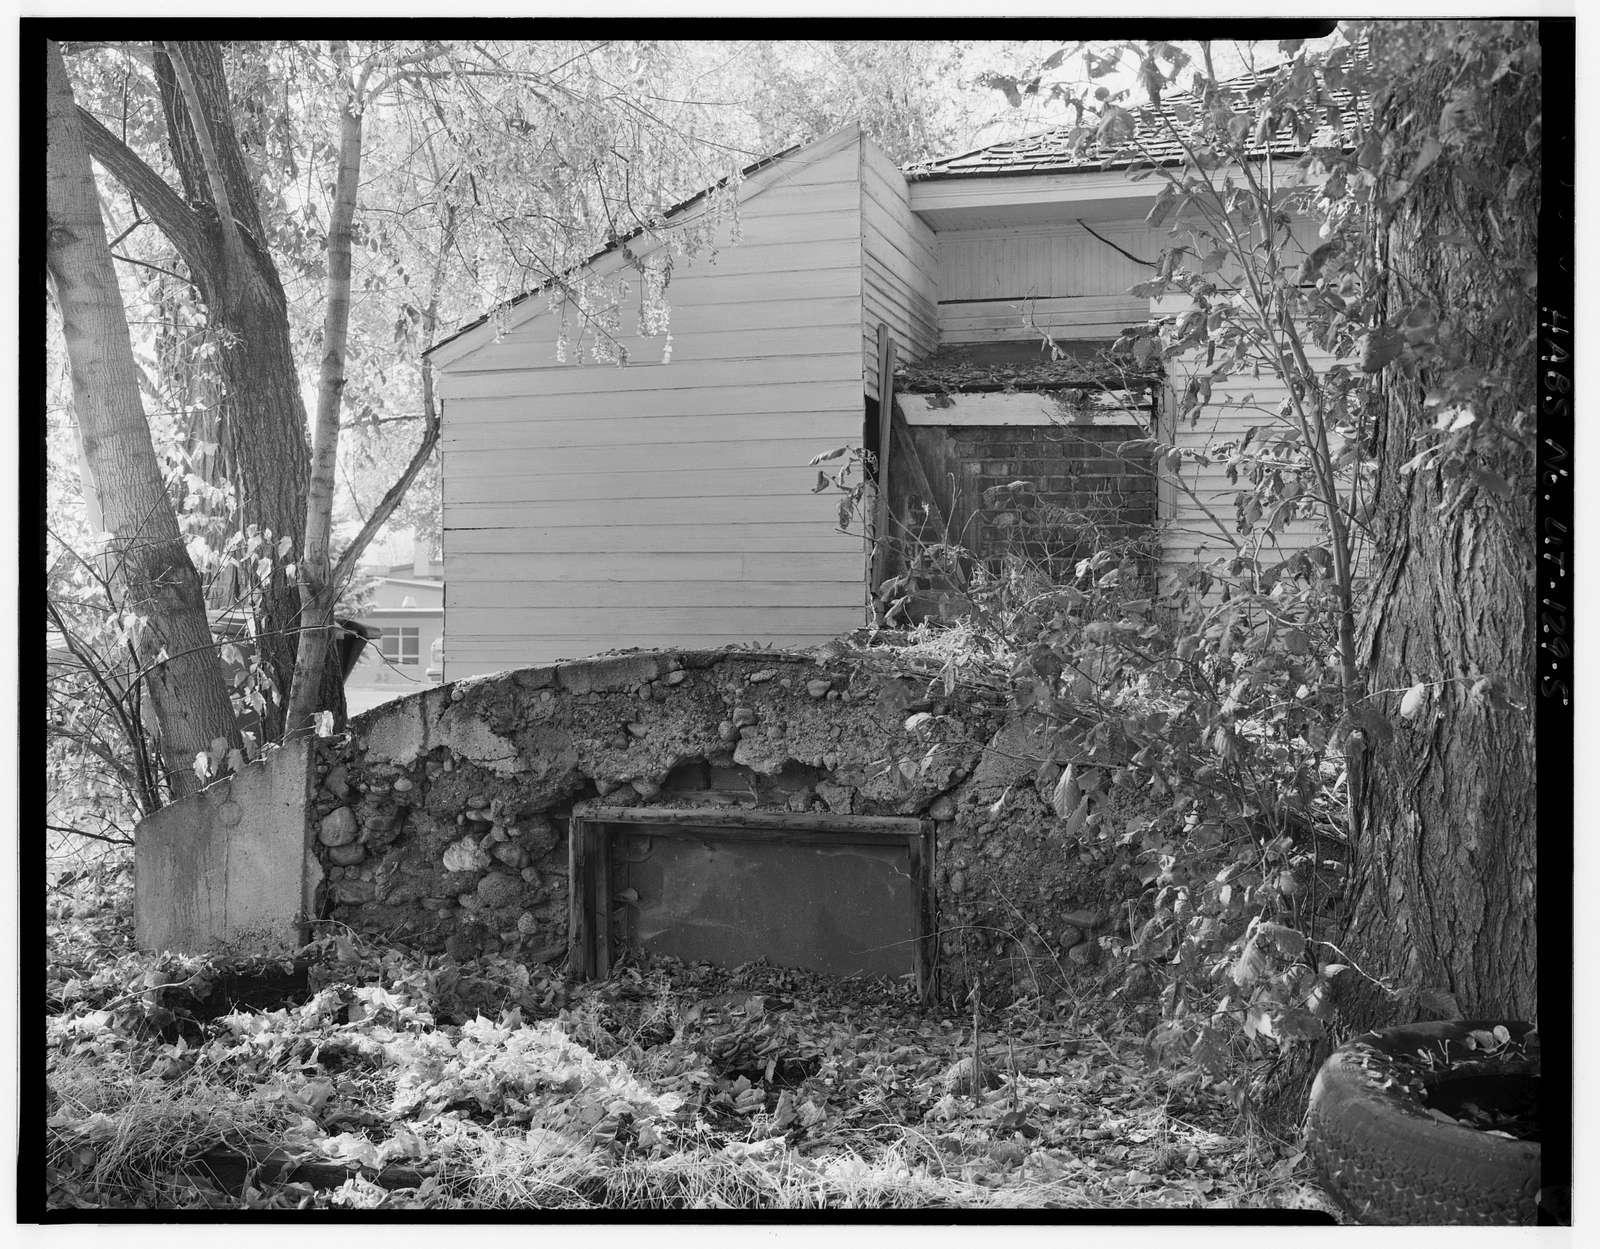 Horace W. Burgon House, 7501 South 700 East, Union, Salt Lake County, UT